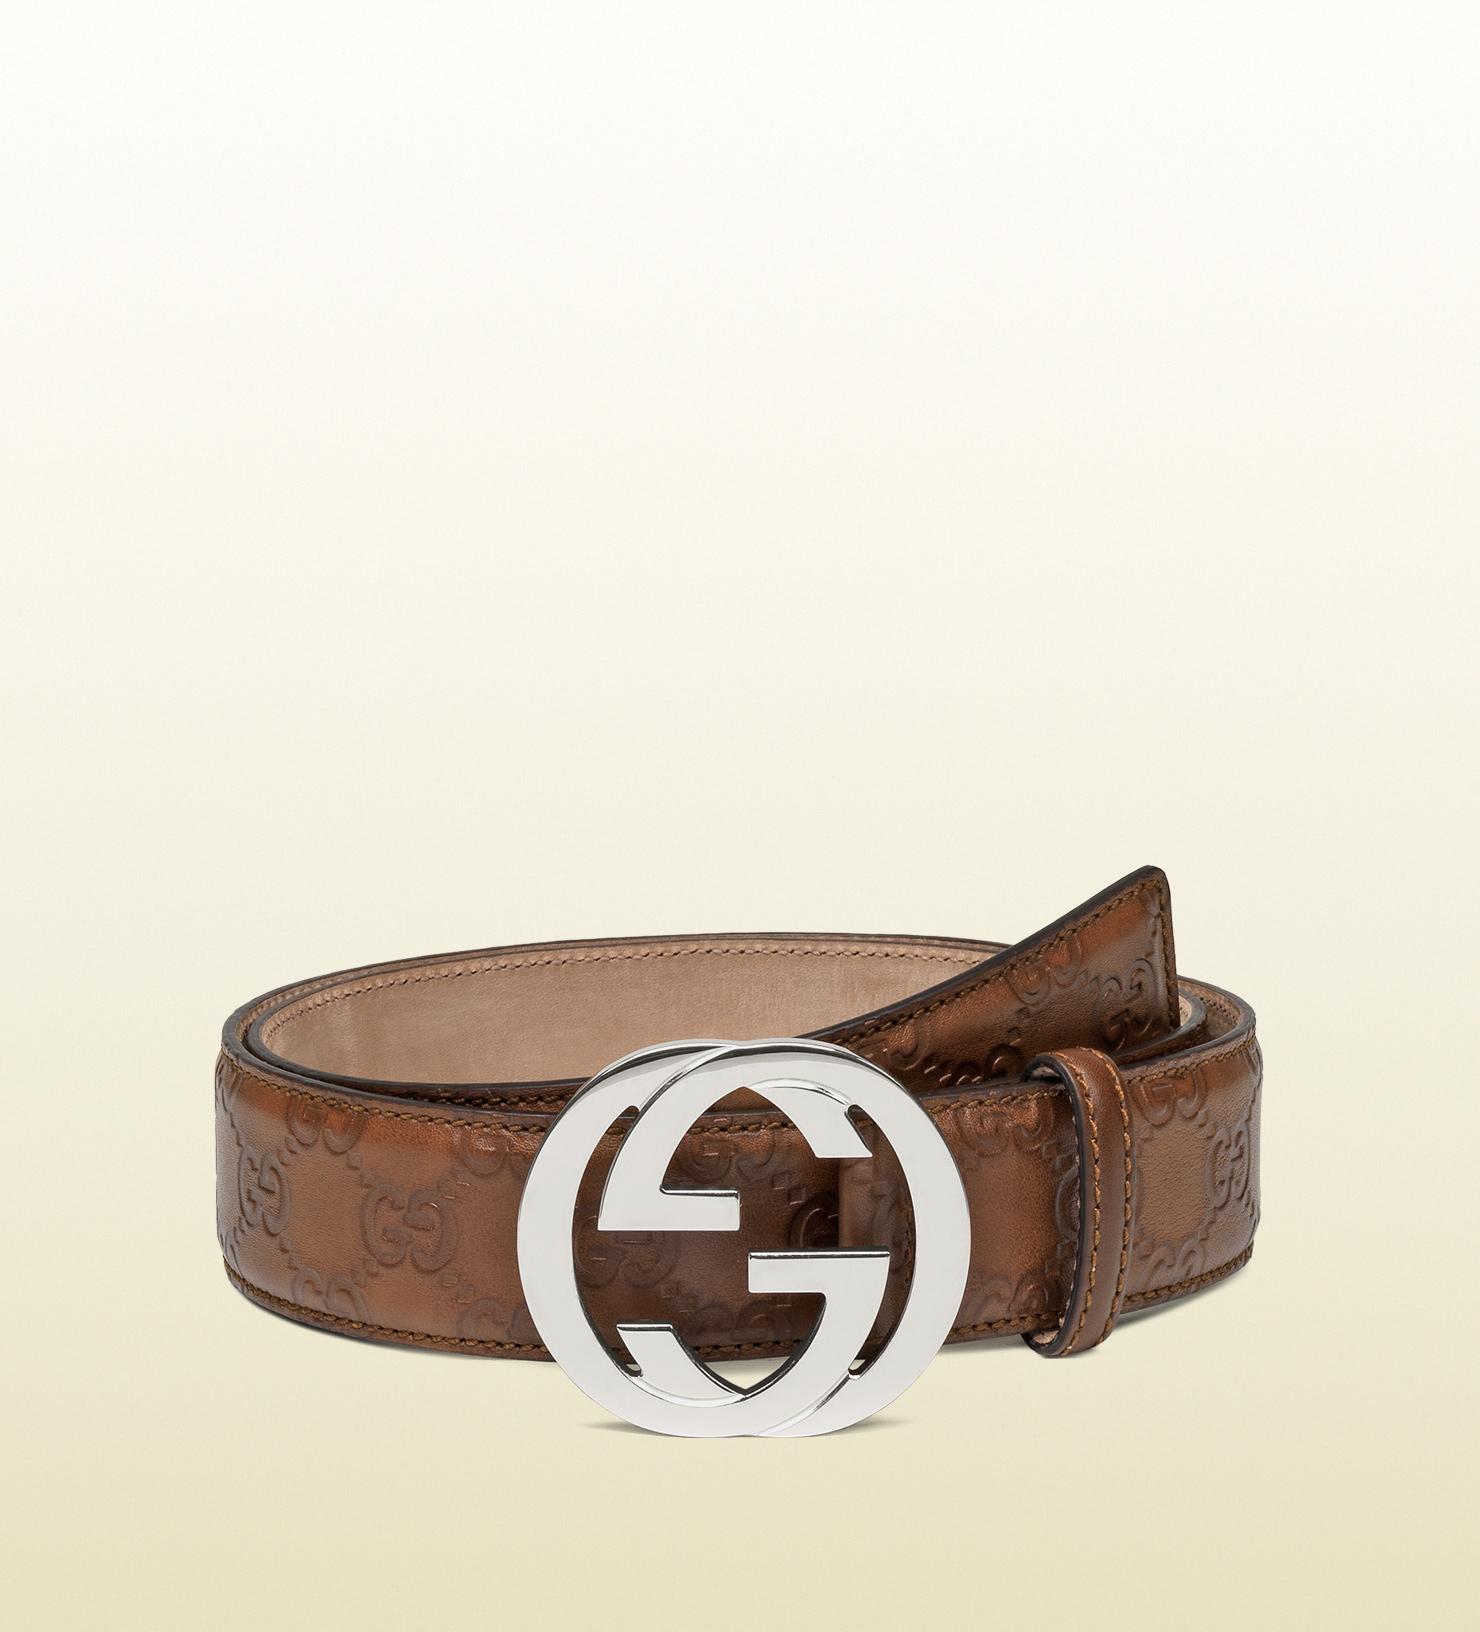 Lyst Gucci Belt With Interlocking G Buckle In Brown For Men